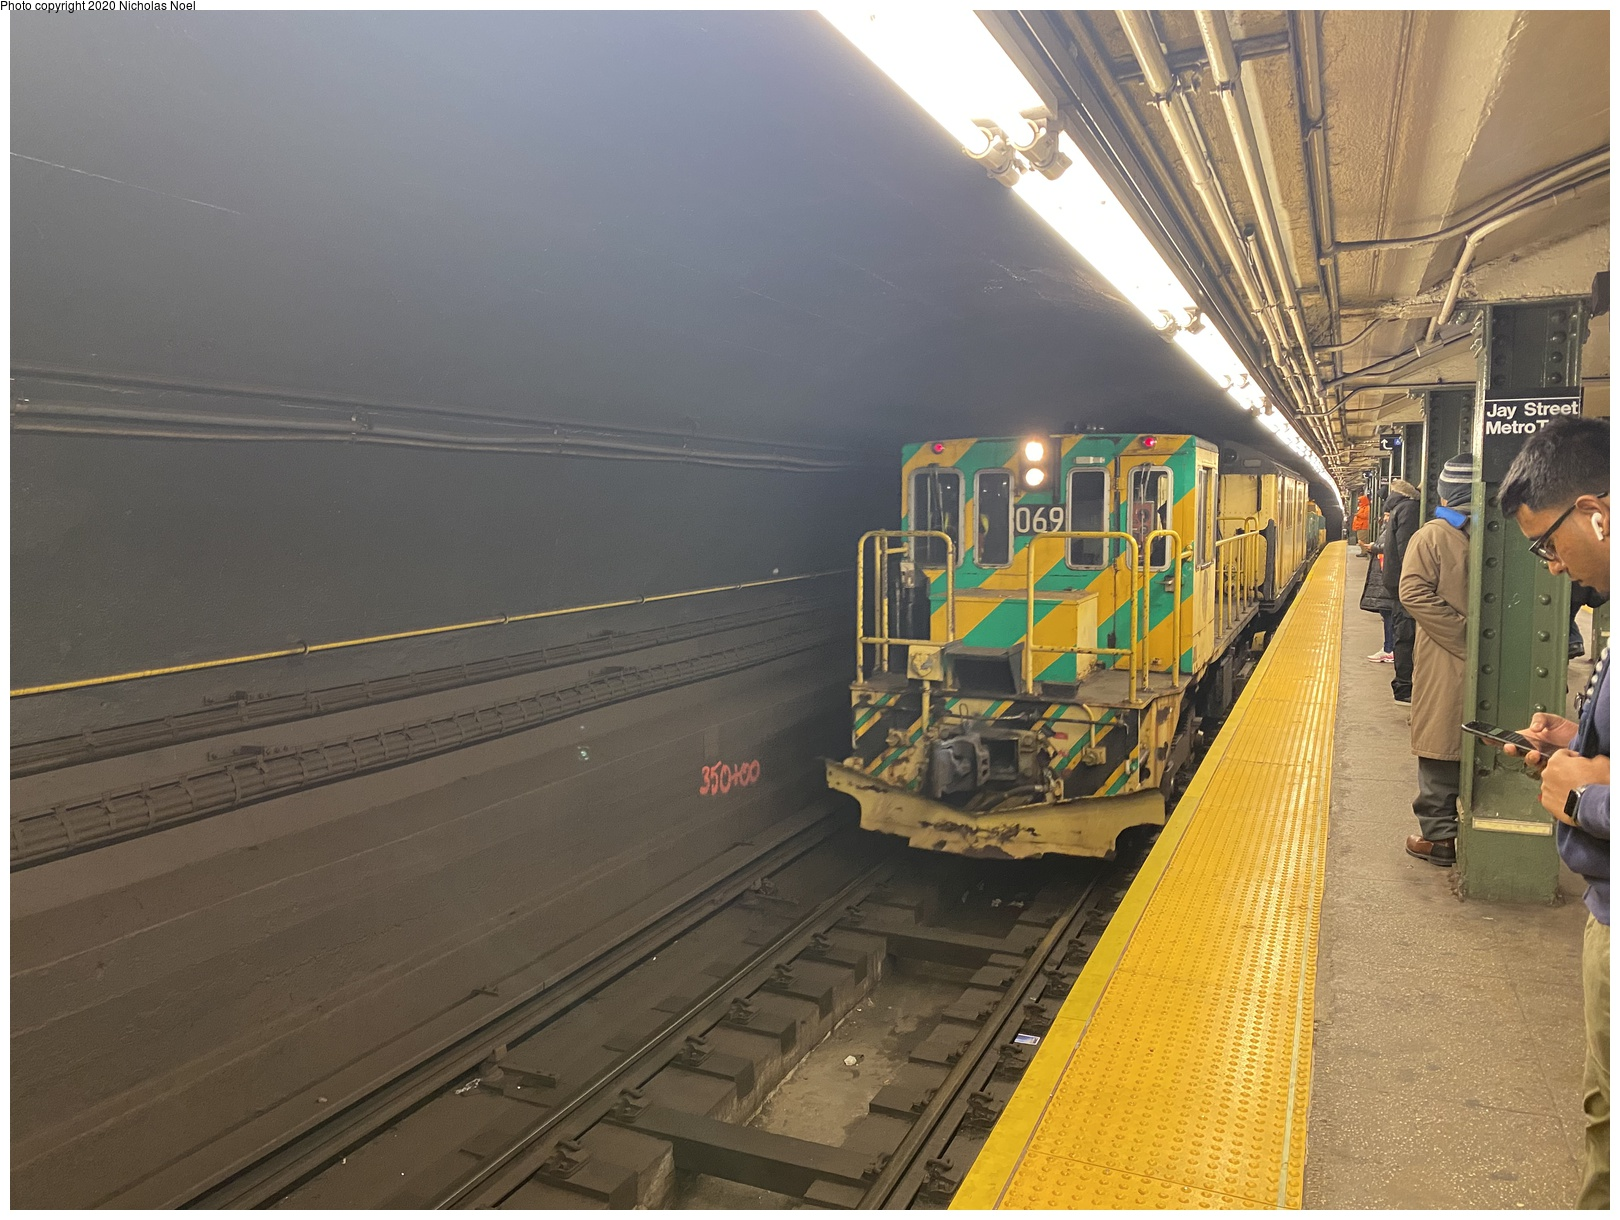 (669k, 1620x1220)<br><b>Country:</b> United States<br><b>City:</b> New York<br><b>System:</b> New York City Transit<br><b>Line:</b> BMT Broadway Line<br><b>Location:</b> Jay St./Metrotech (Lawrence St.)<br><b>Route:</b> Work Service<br><b>Car:</b> R-47 Locomotive 69 <br><b>Photo by:</b> Nicholas Noel<br><b>Date:</b> 3/5/2020<br><b>Viewed (this week/total):</b> 1 / 173